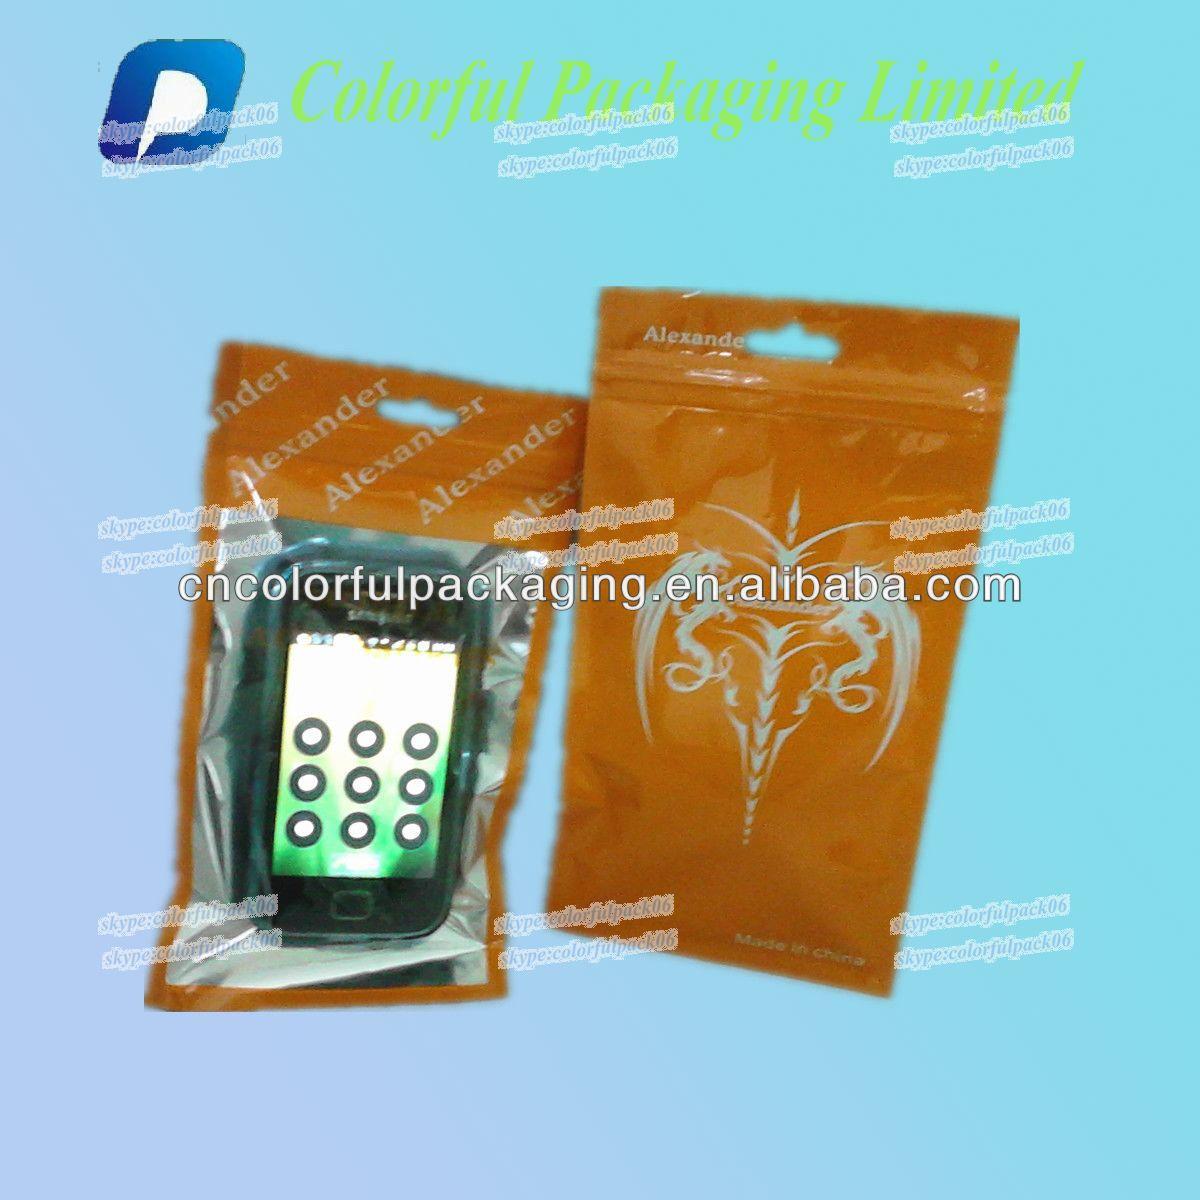 plastic packaging bag for headphones